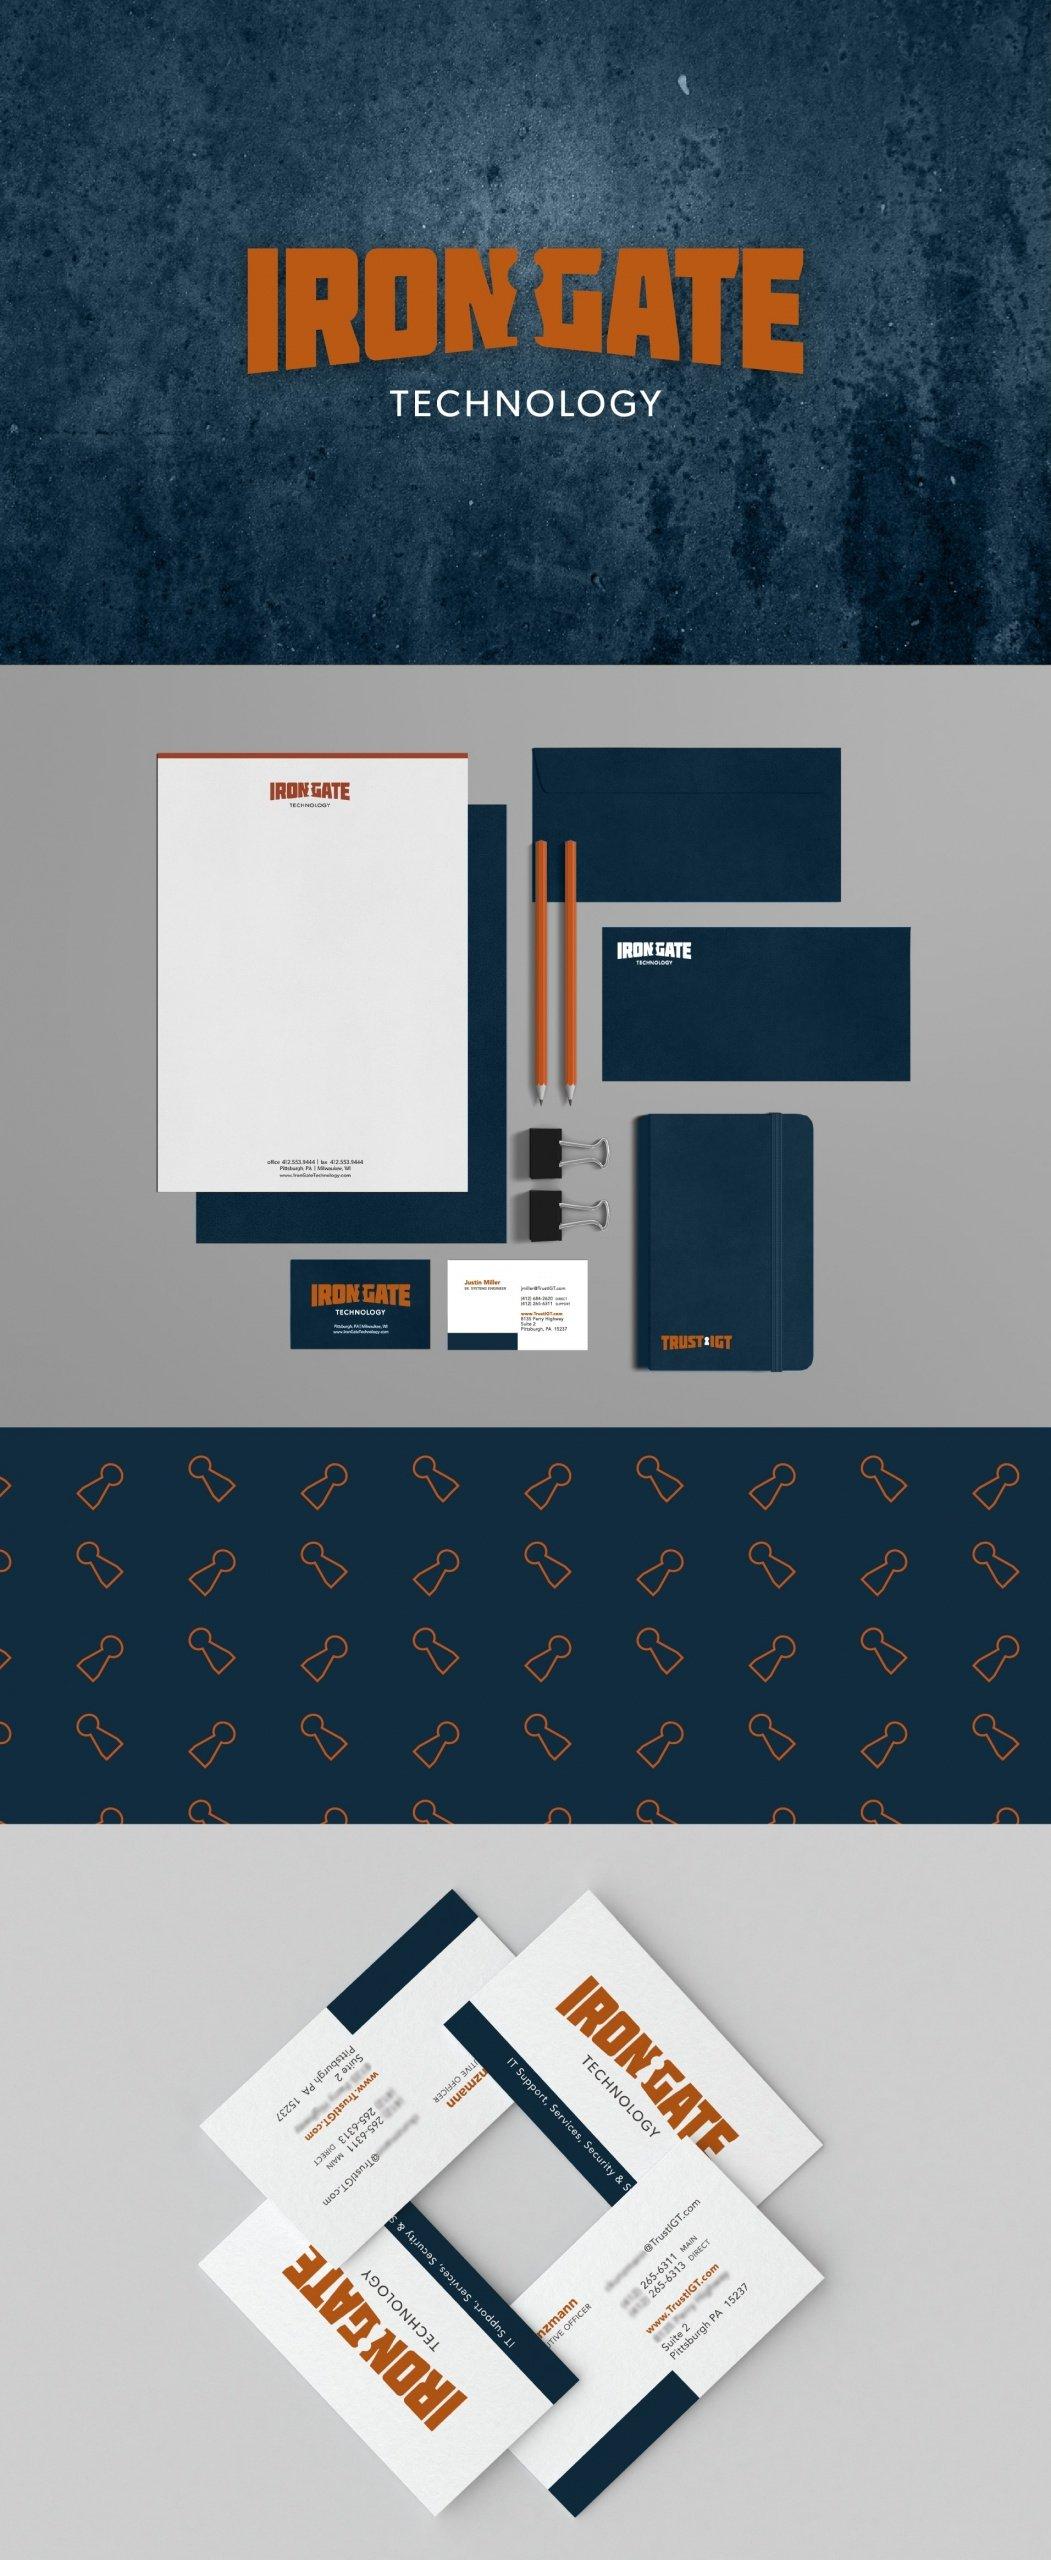 Irongate Technology | branding logo design marketing | Jessica Salinas Design